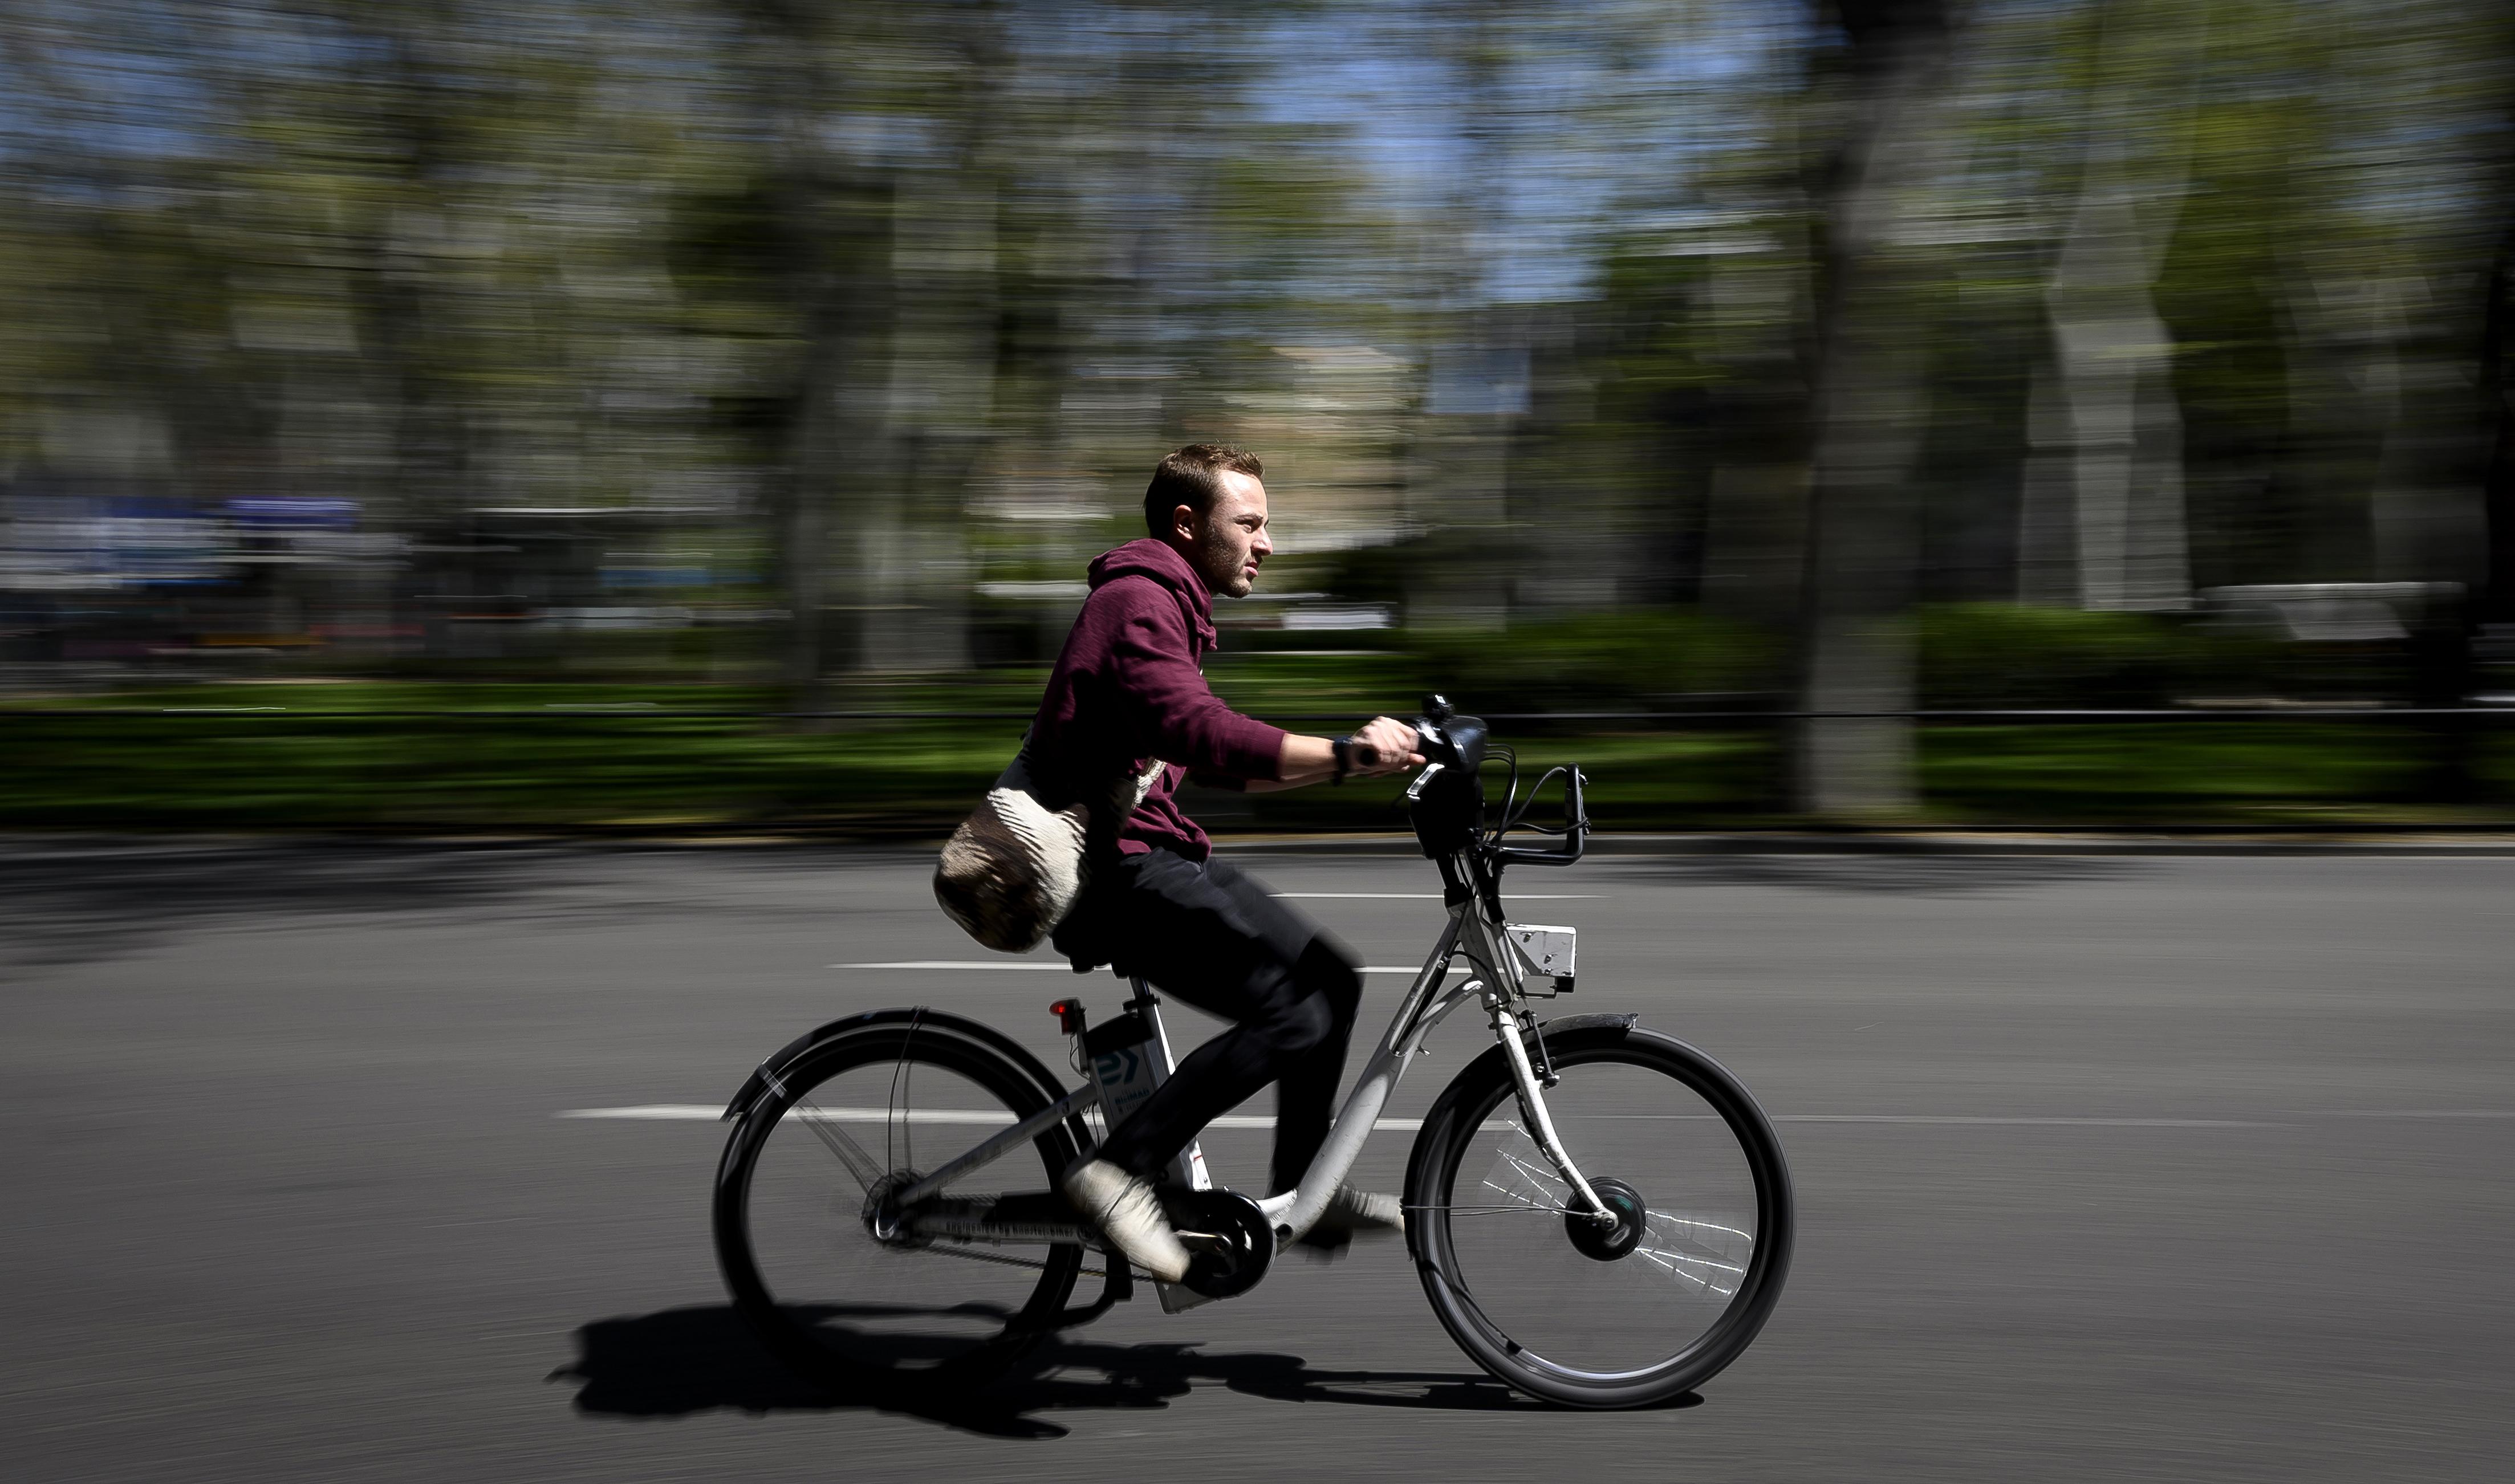 A man in a red hooded sweatshirt rides an e-bike in Spain.